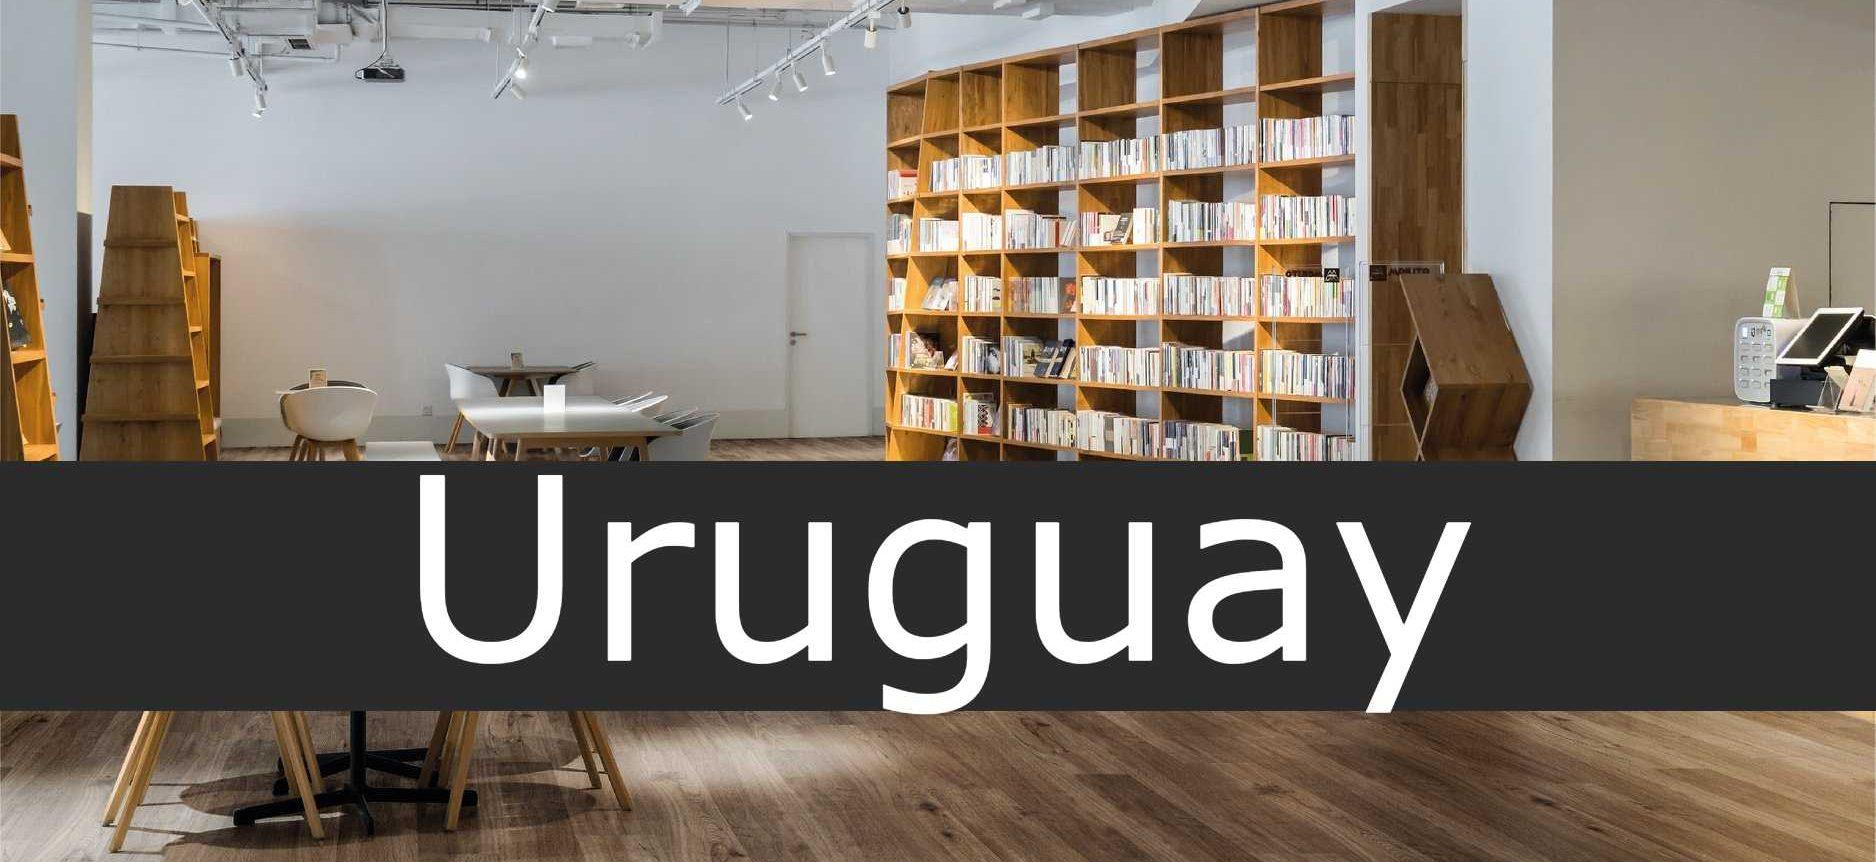 vinibel Uruguay